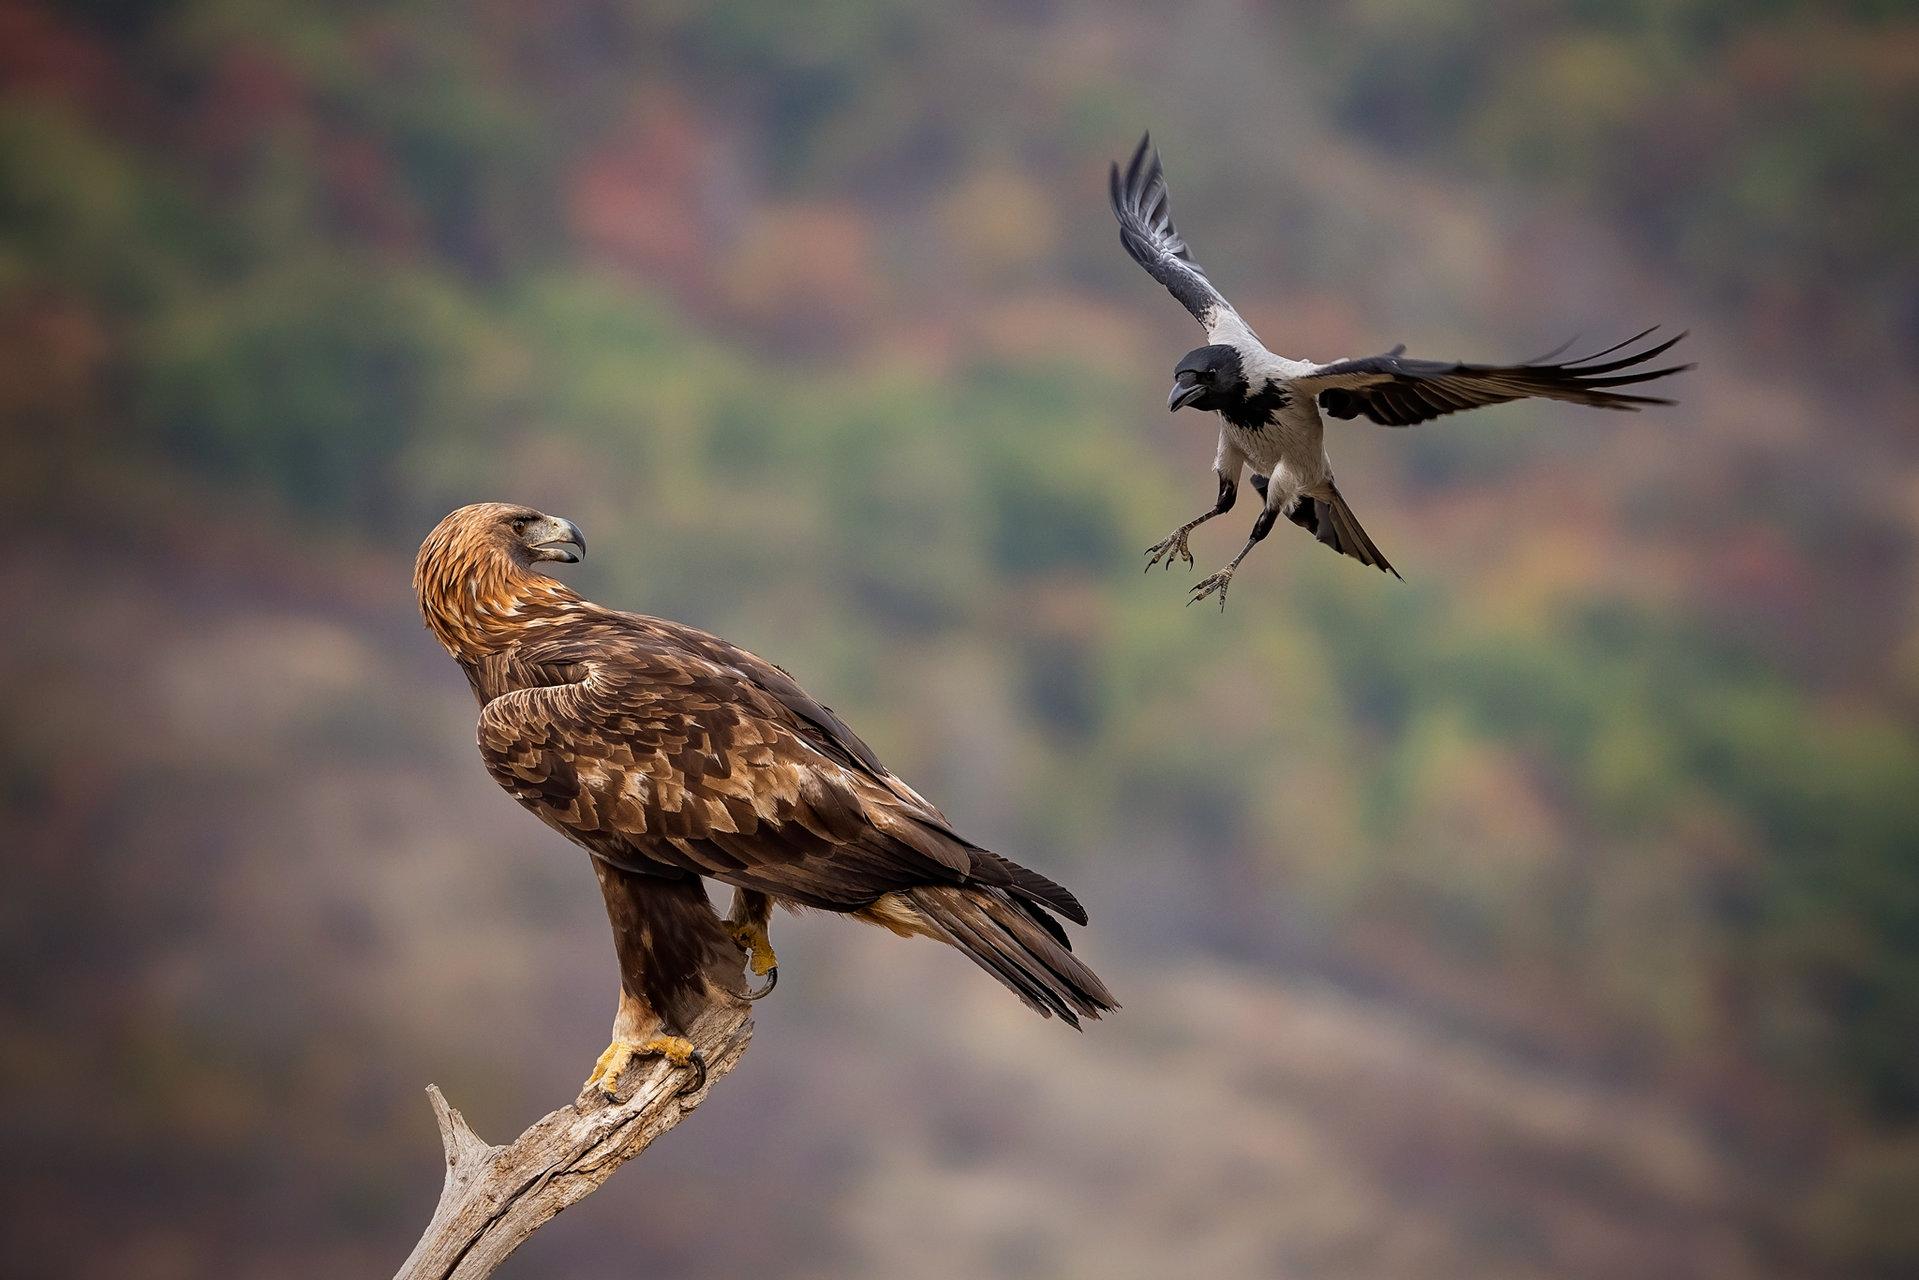 Възхищавам се на Сивата врана за смелоста и да прогони Скалния орел... | Author edobg | PHOTO FORUM